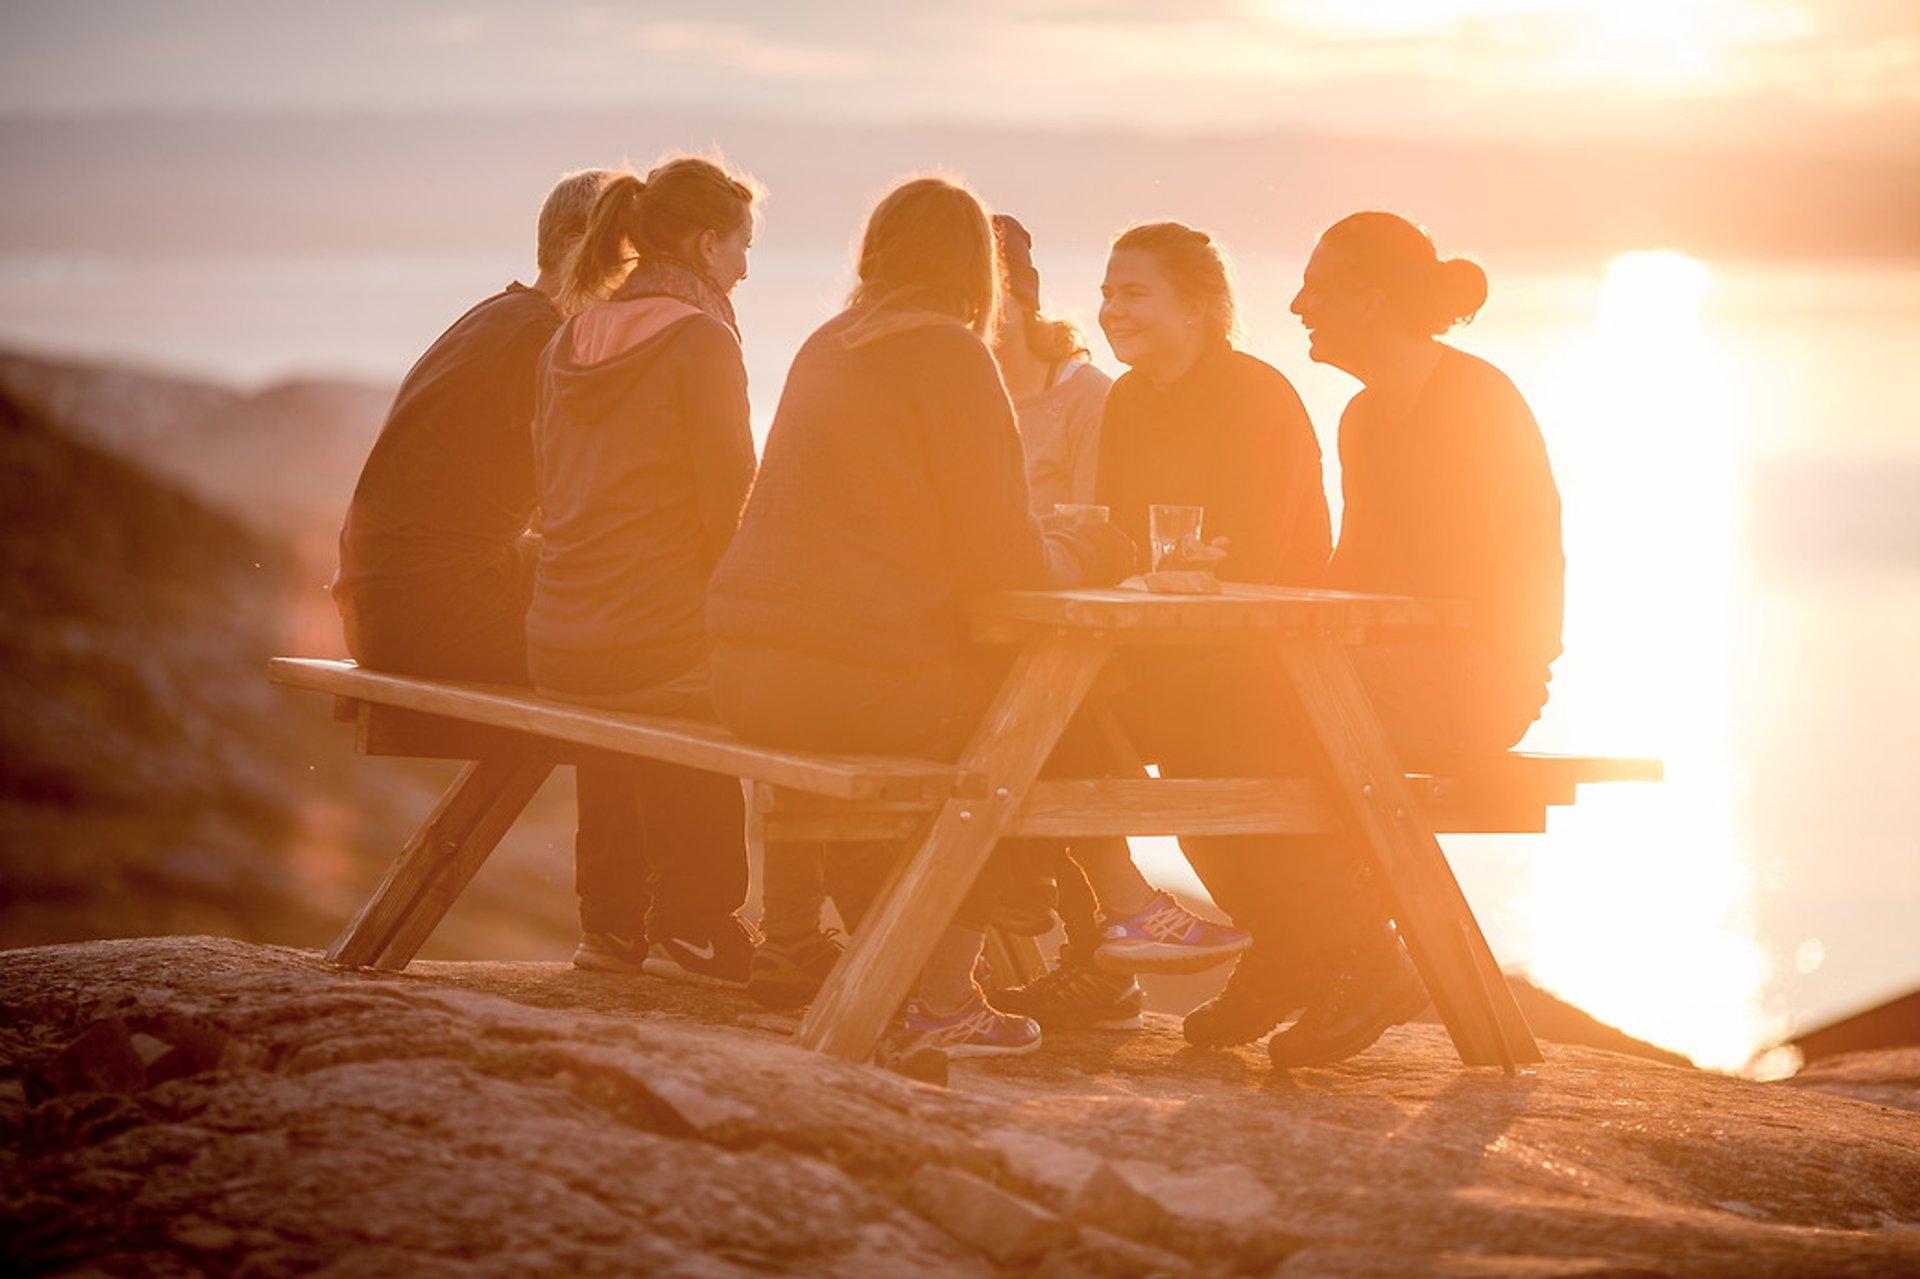 Midnight Sun in Greenland 2020 - Best Time